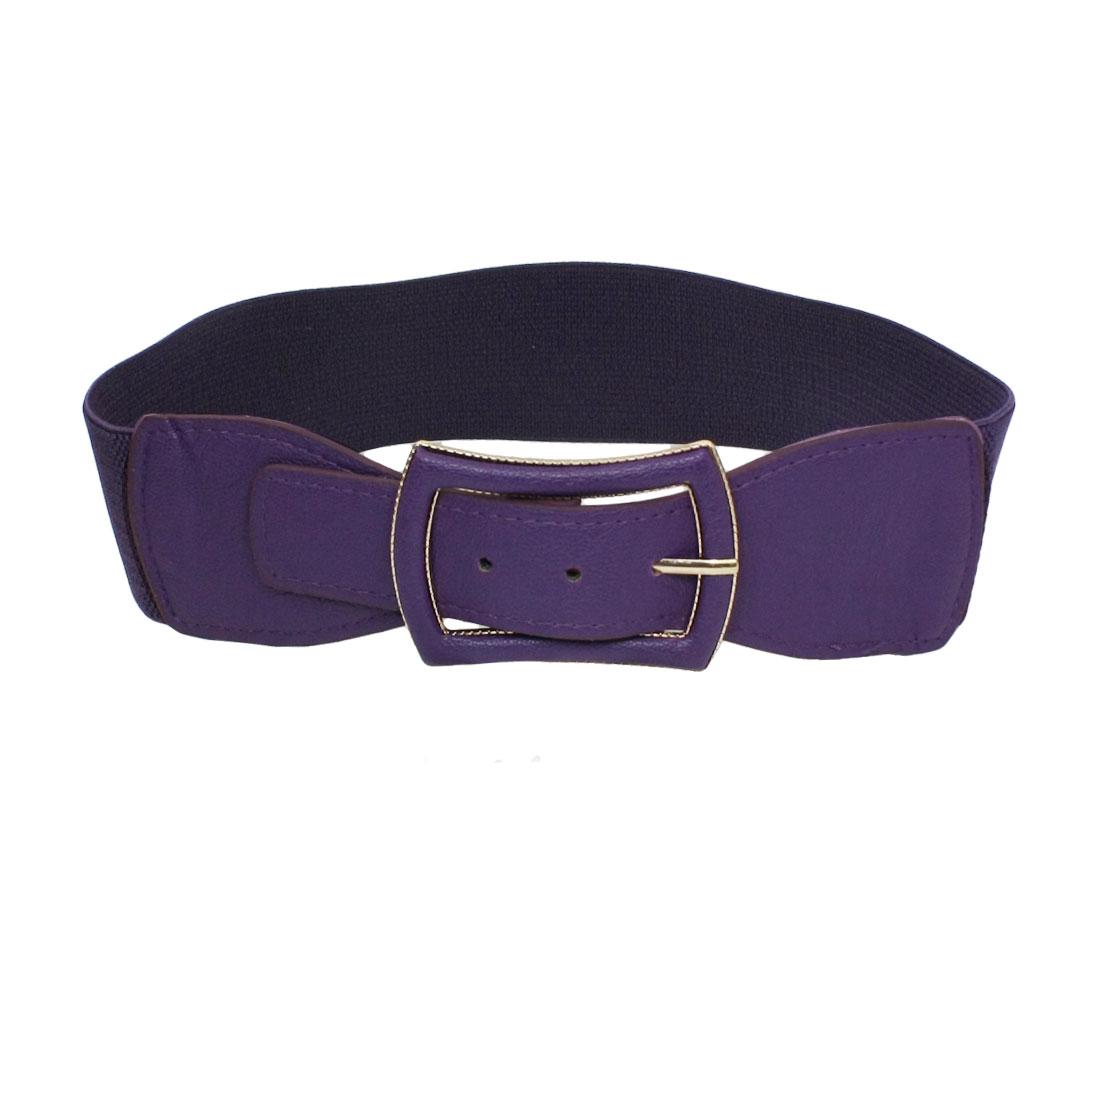 Women Single Pin Buckle Design Elastic Waist Belt Cinch Band Purple